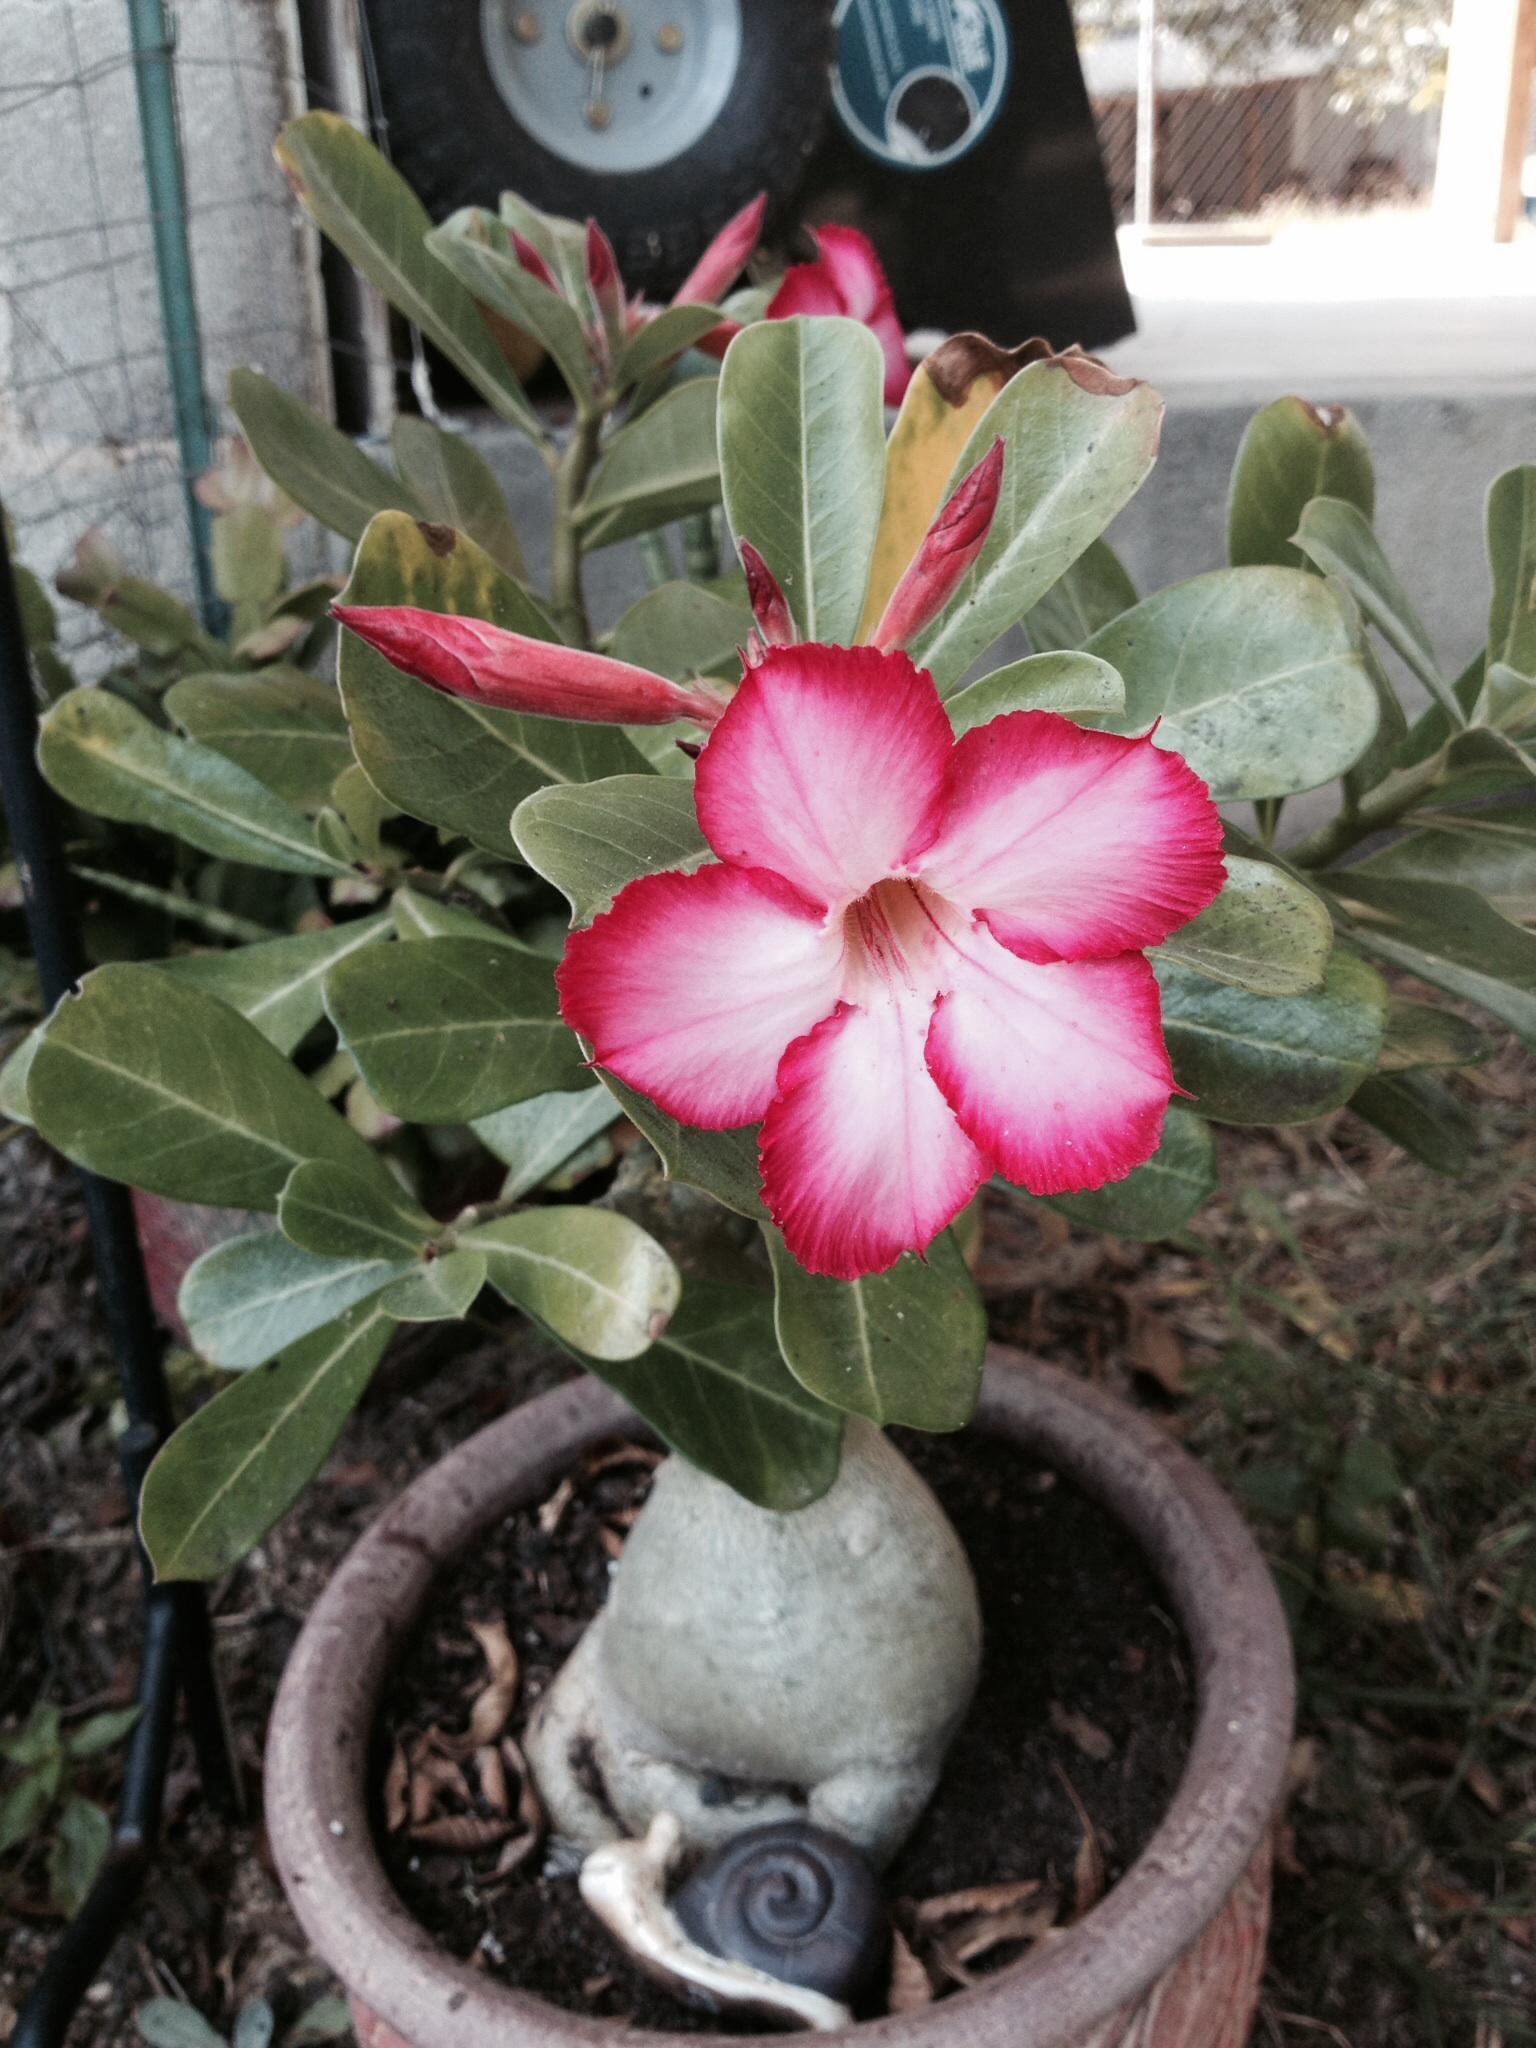 Relieving Identify My Ask Judy Houseplant Desert Rose Careers Desert Rose Care Yellow Leaves houzz 01 Desert Rose Care